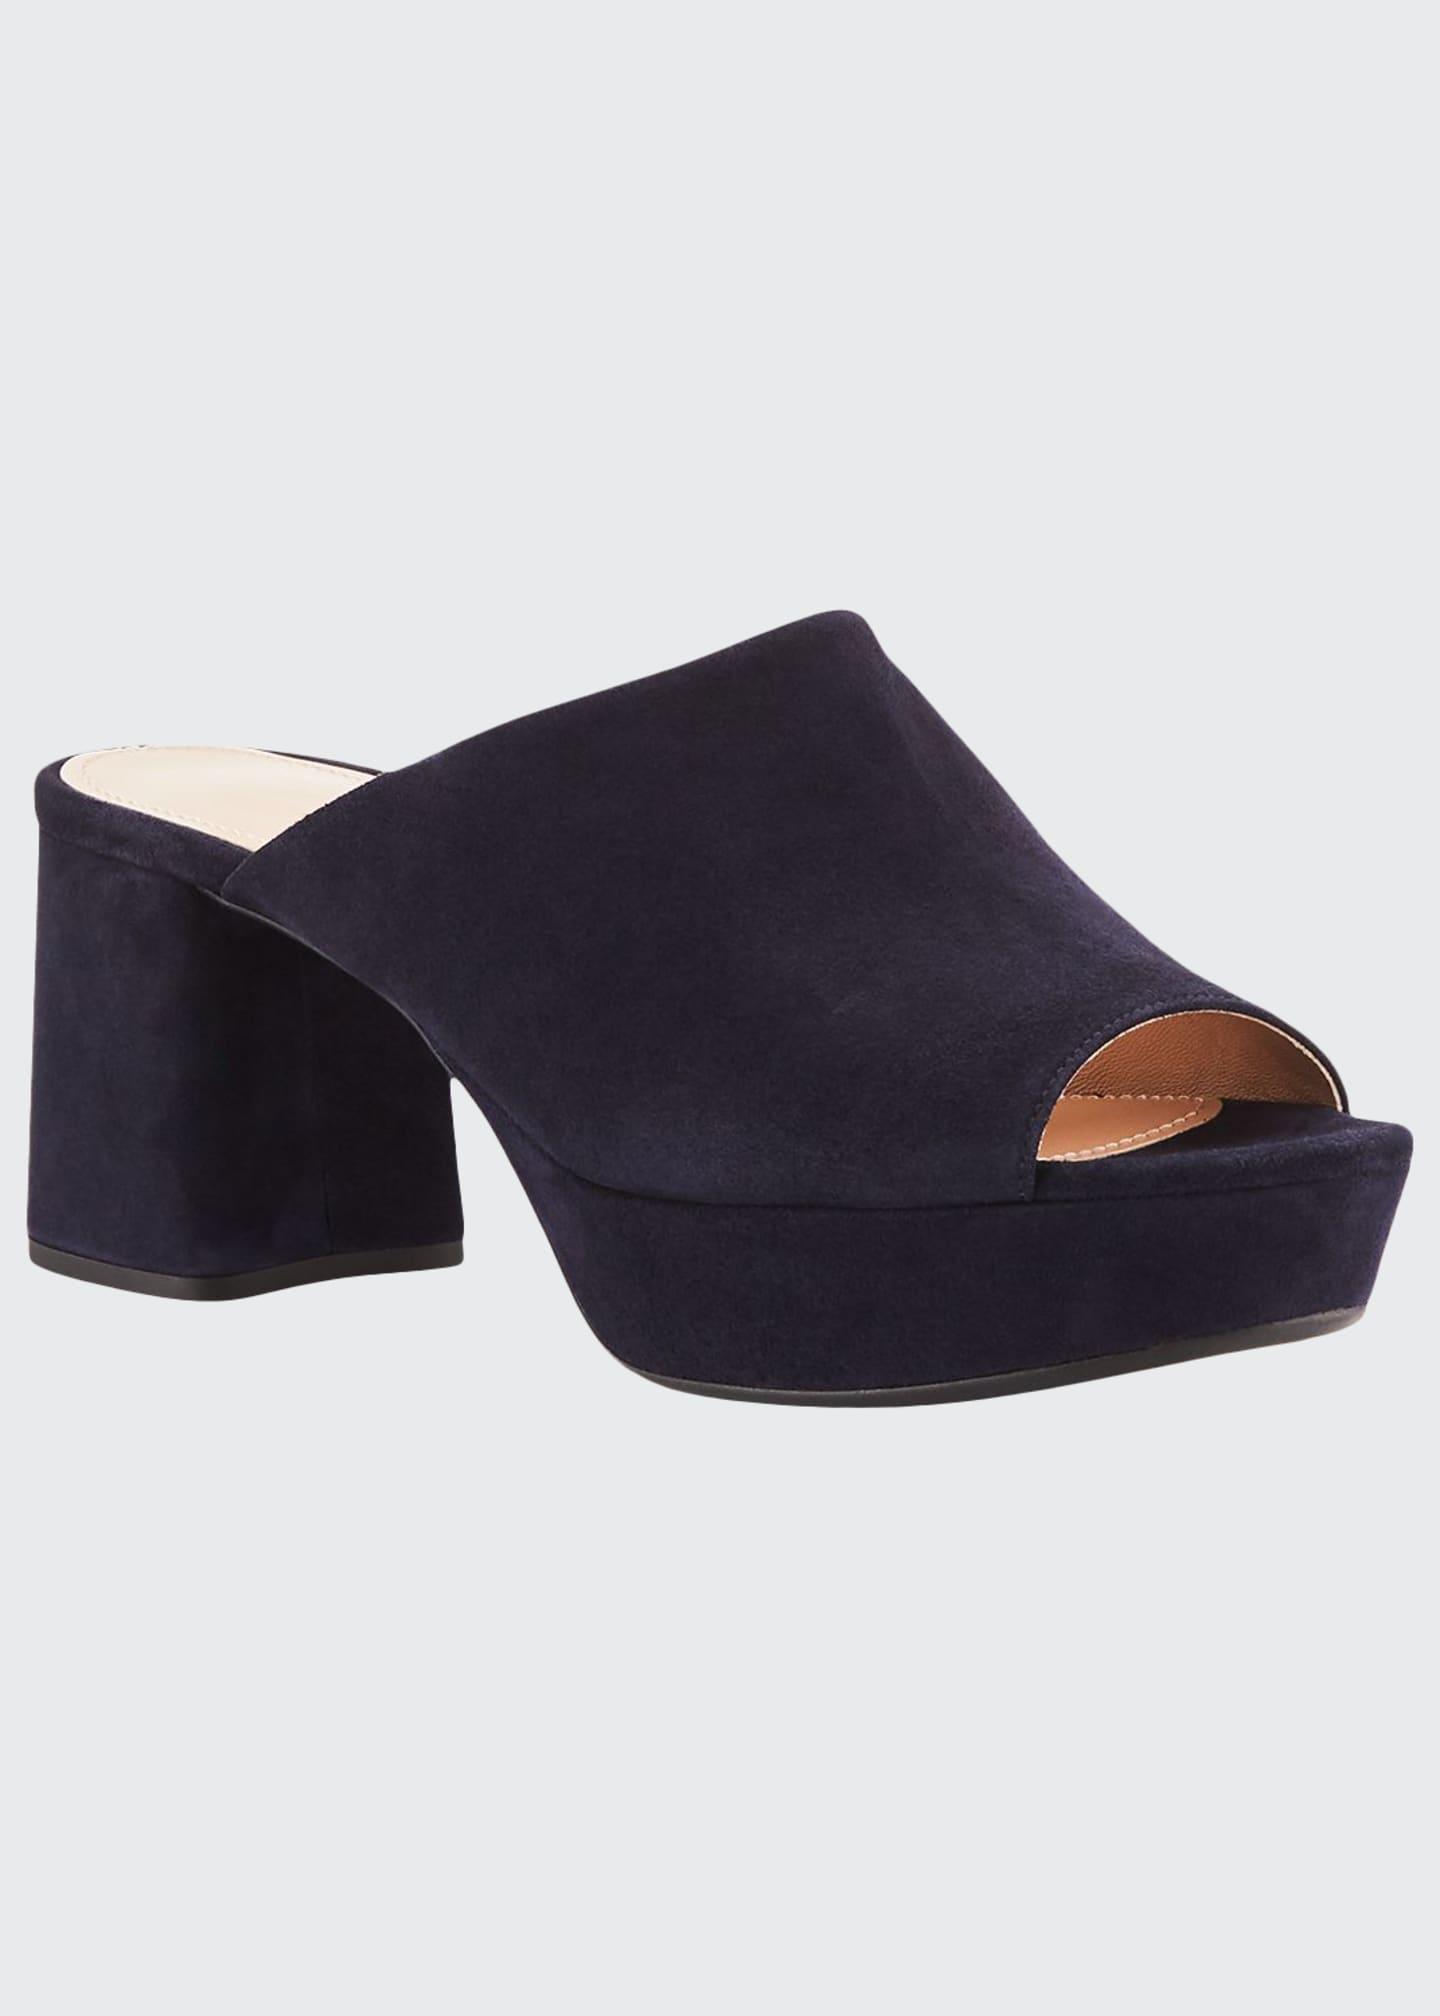 Prada Suede Platform Slide Sandals